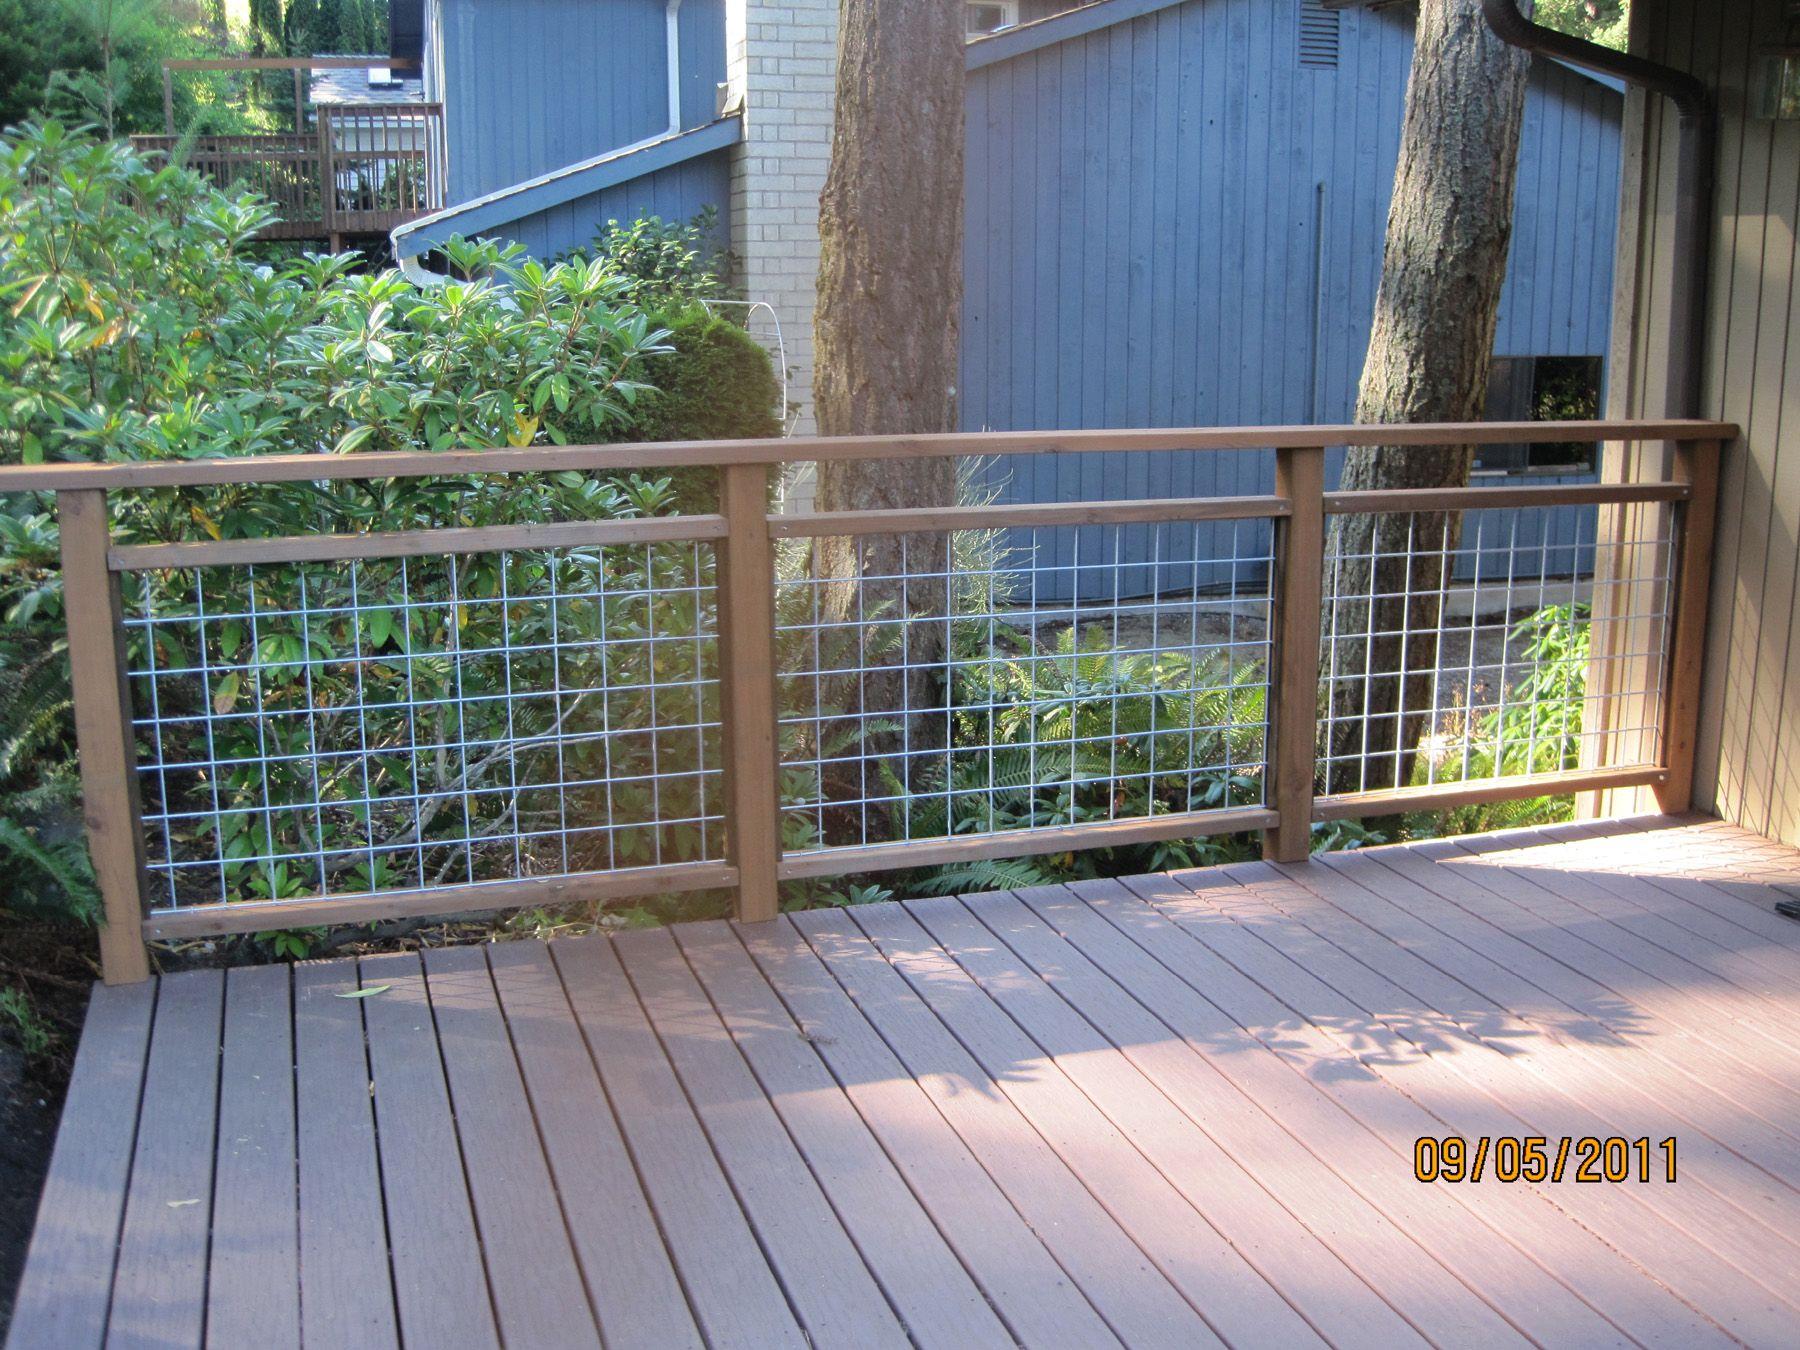 Do It Yourself Deck Railing Is Done Deck Railings Diy Deck Deck Garden